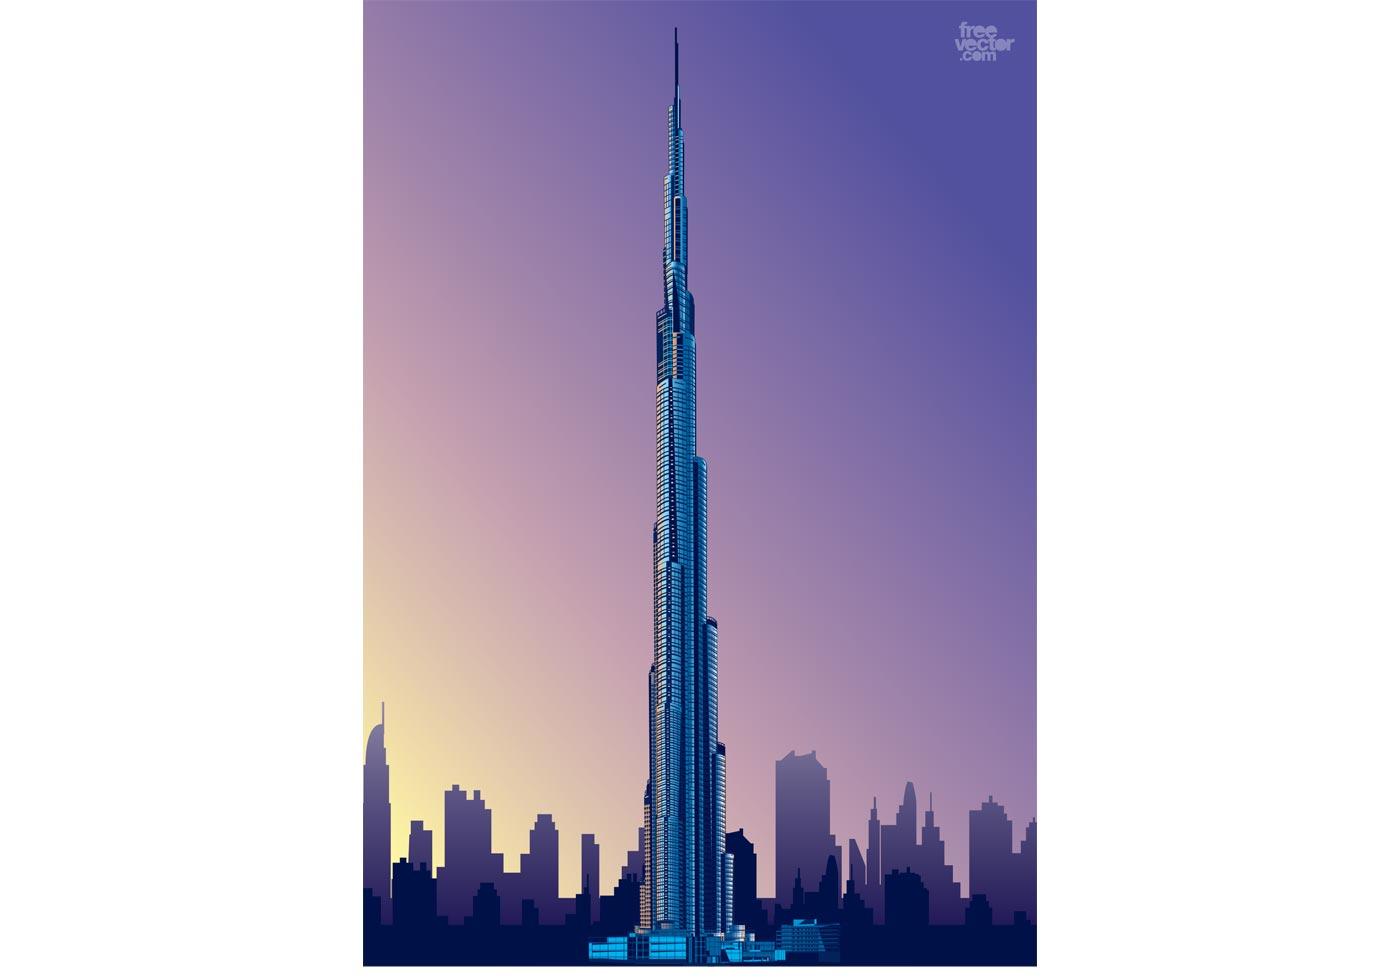 burj khalifa download free vector art stock graphics images rh vecteezy com cityscape vector outline cityscape vector eps